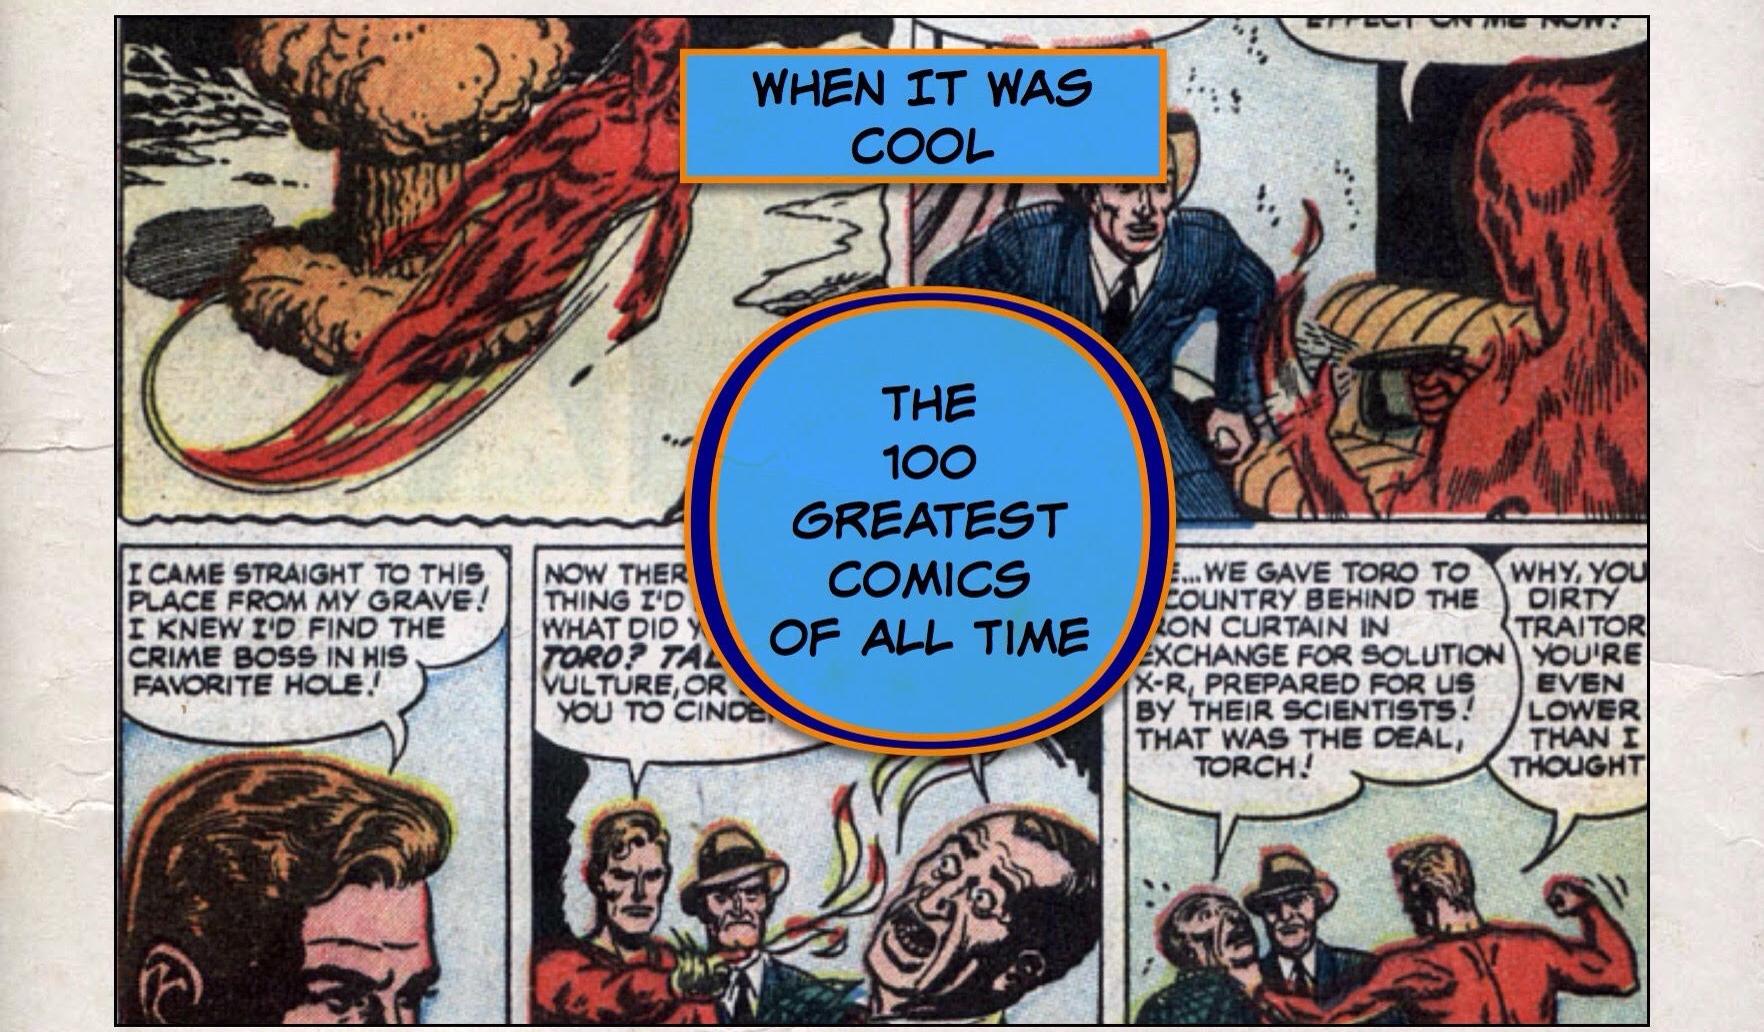 100 Greatest Comic Books Ever.jpg